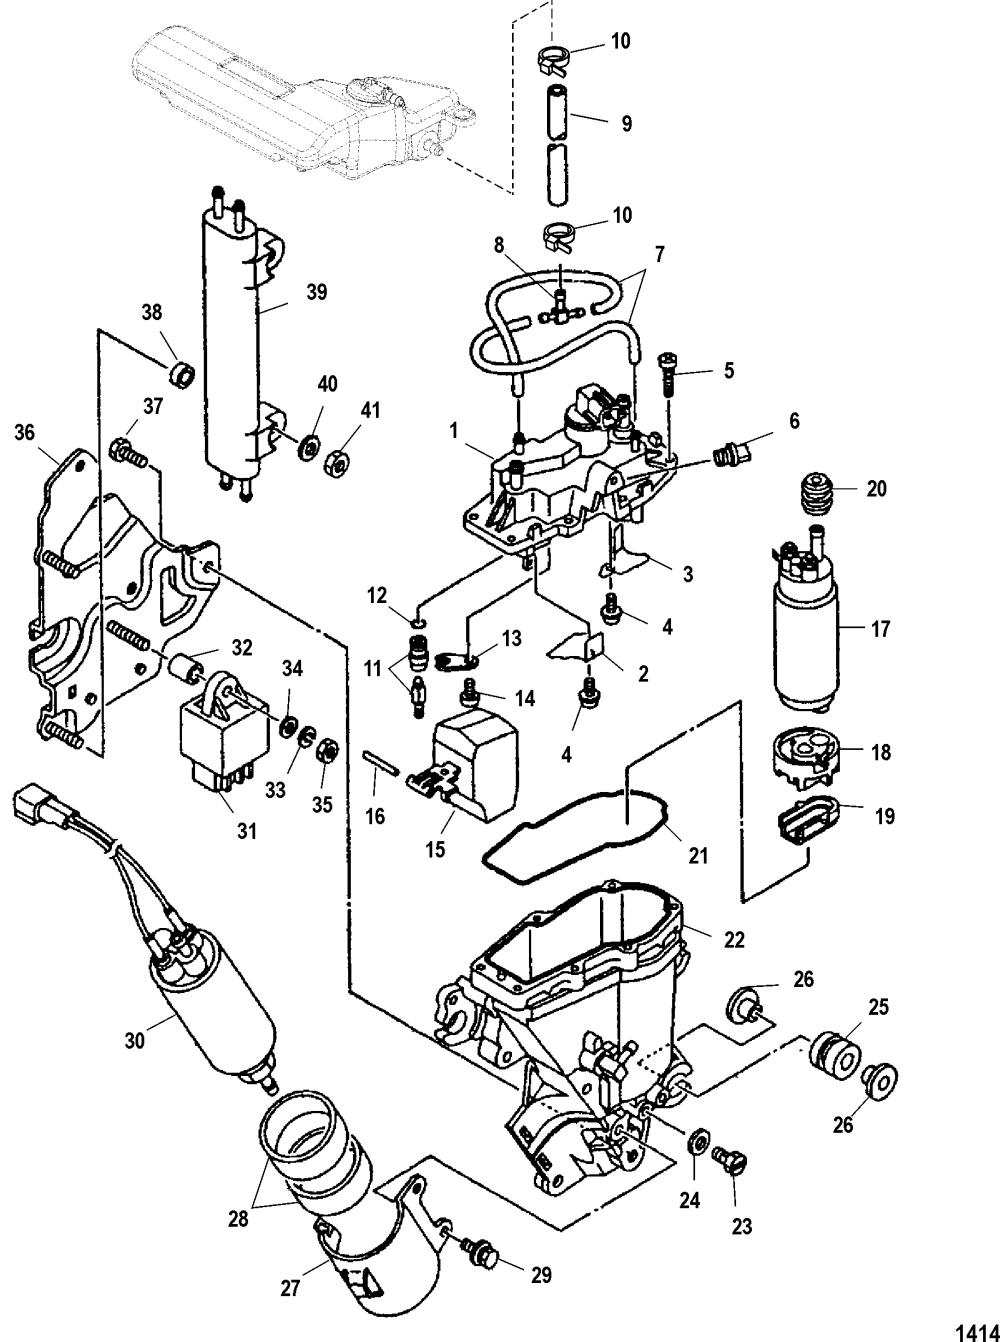 medium resolution of mercury 225 efi fuel filter auto electrical wiring diagram nandgate til crystal circuit diagram tradeoficcom